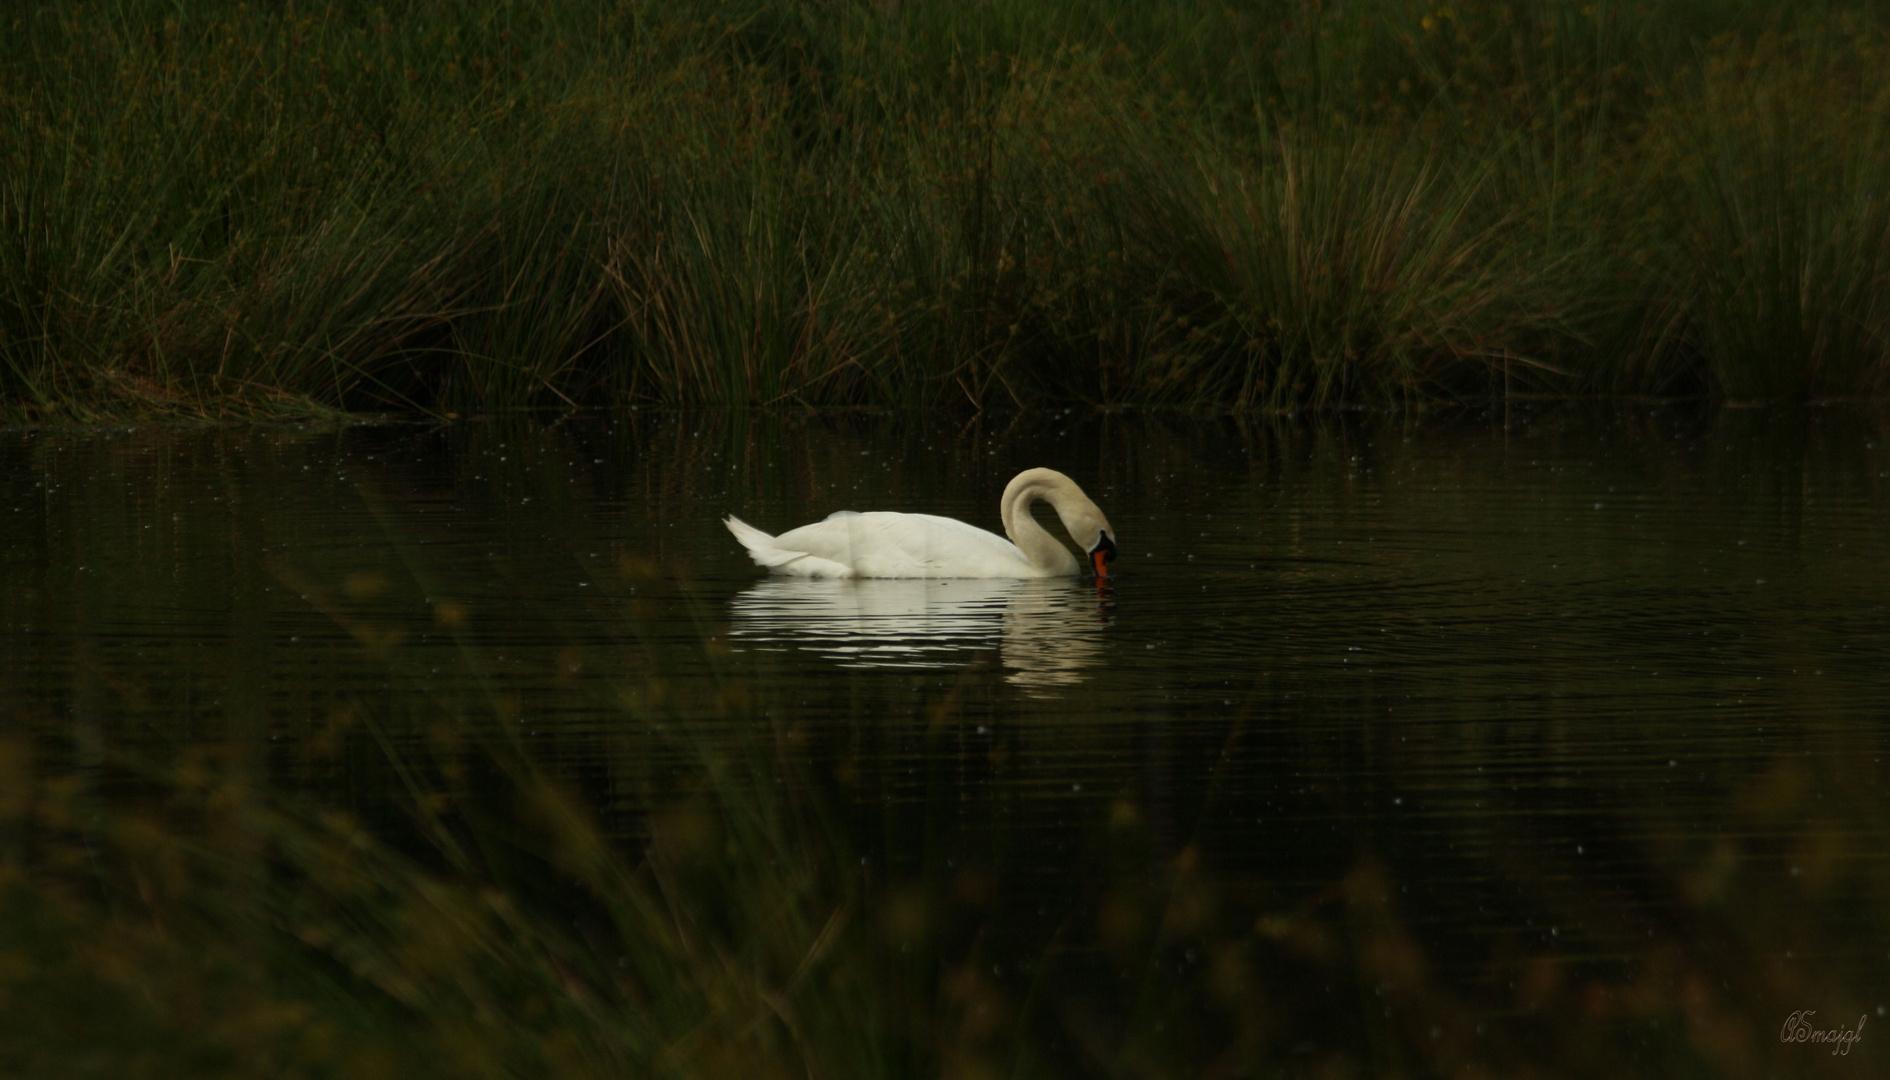 The swan_impressions IV